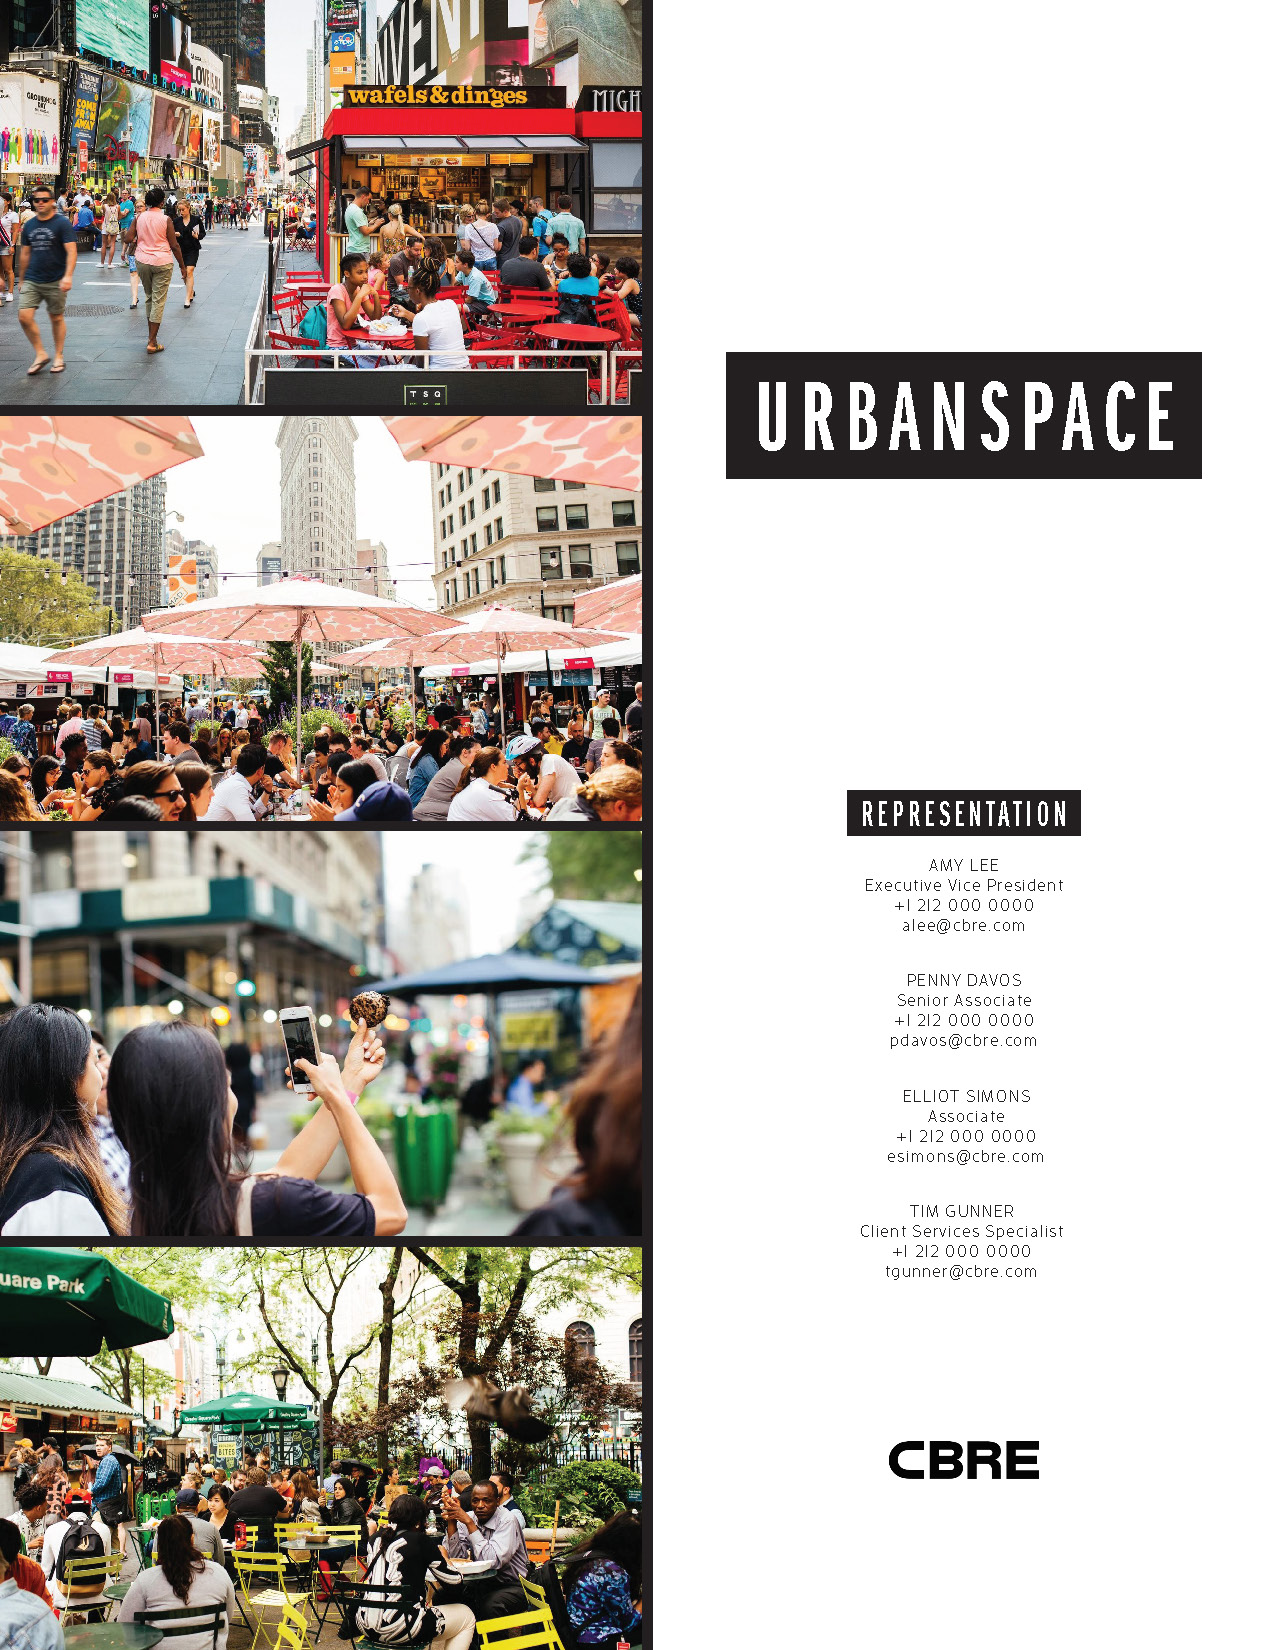 Urbanspace_v3_Page_38.jpg